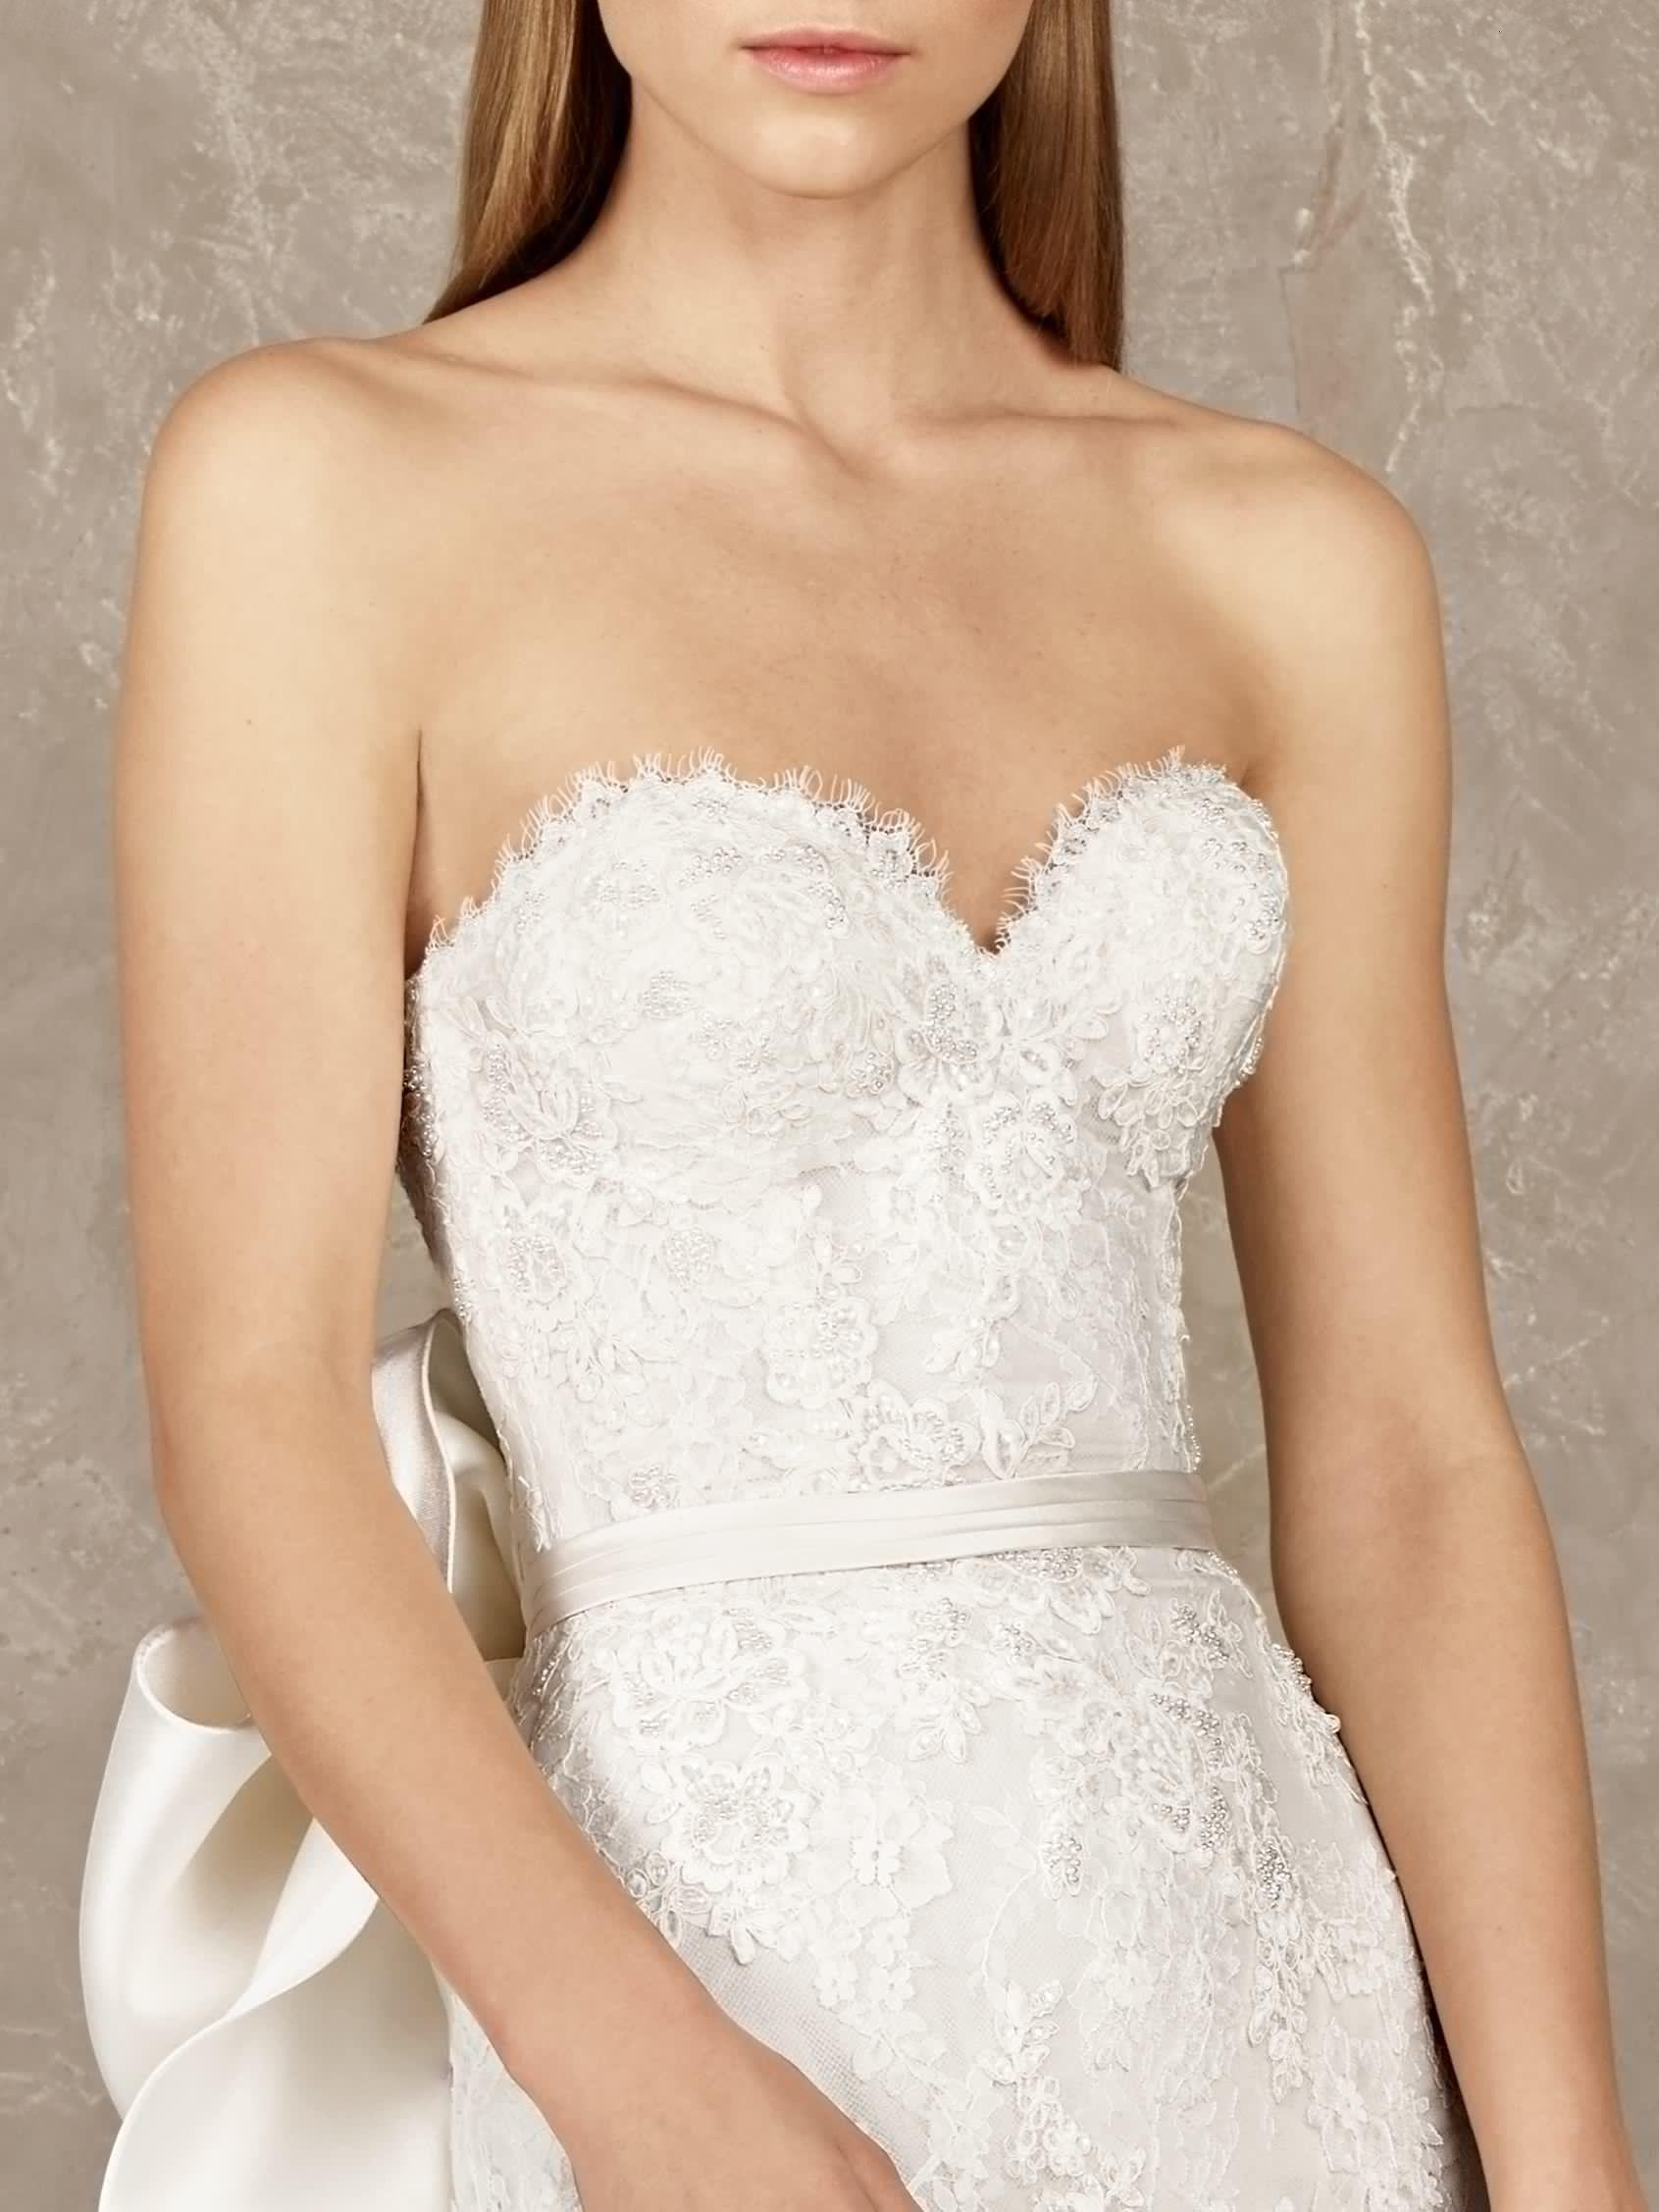 Original Mermaid Wedding Dress With Detachable Skirt Pronovias Yoisi Dresses Wedding Dresses Bridesmaid Dresses